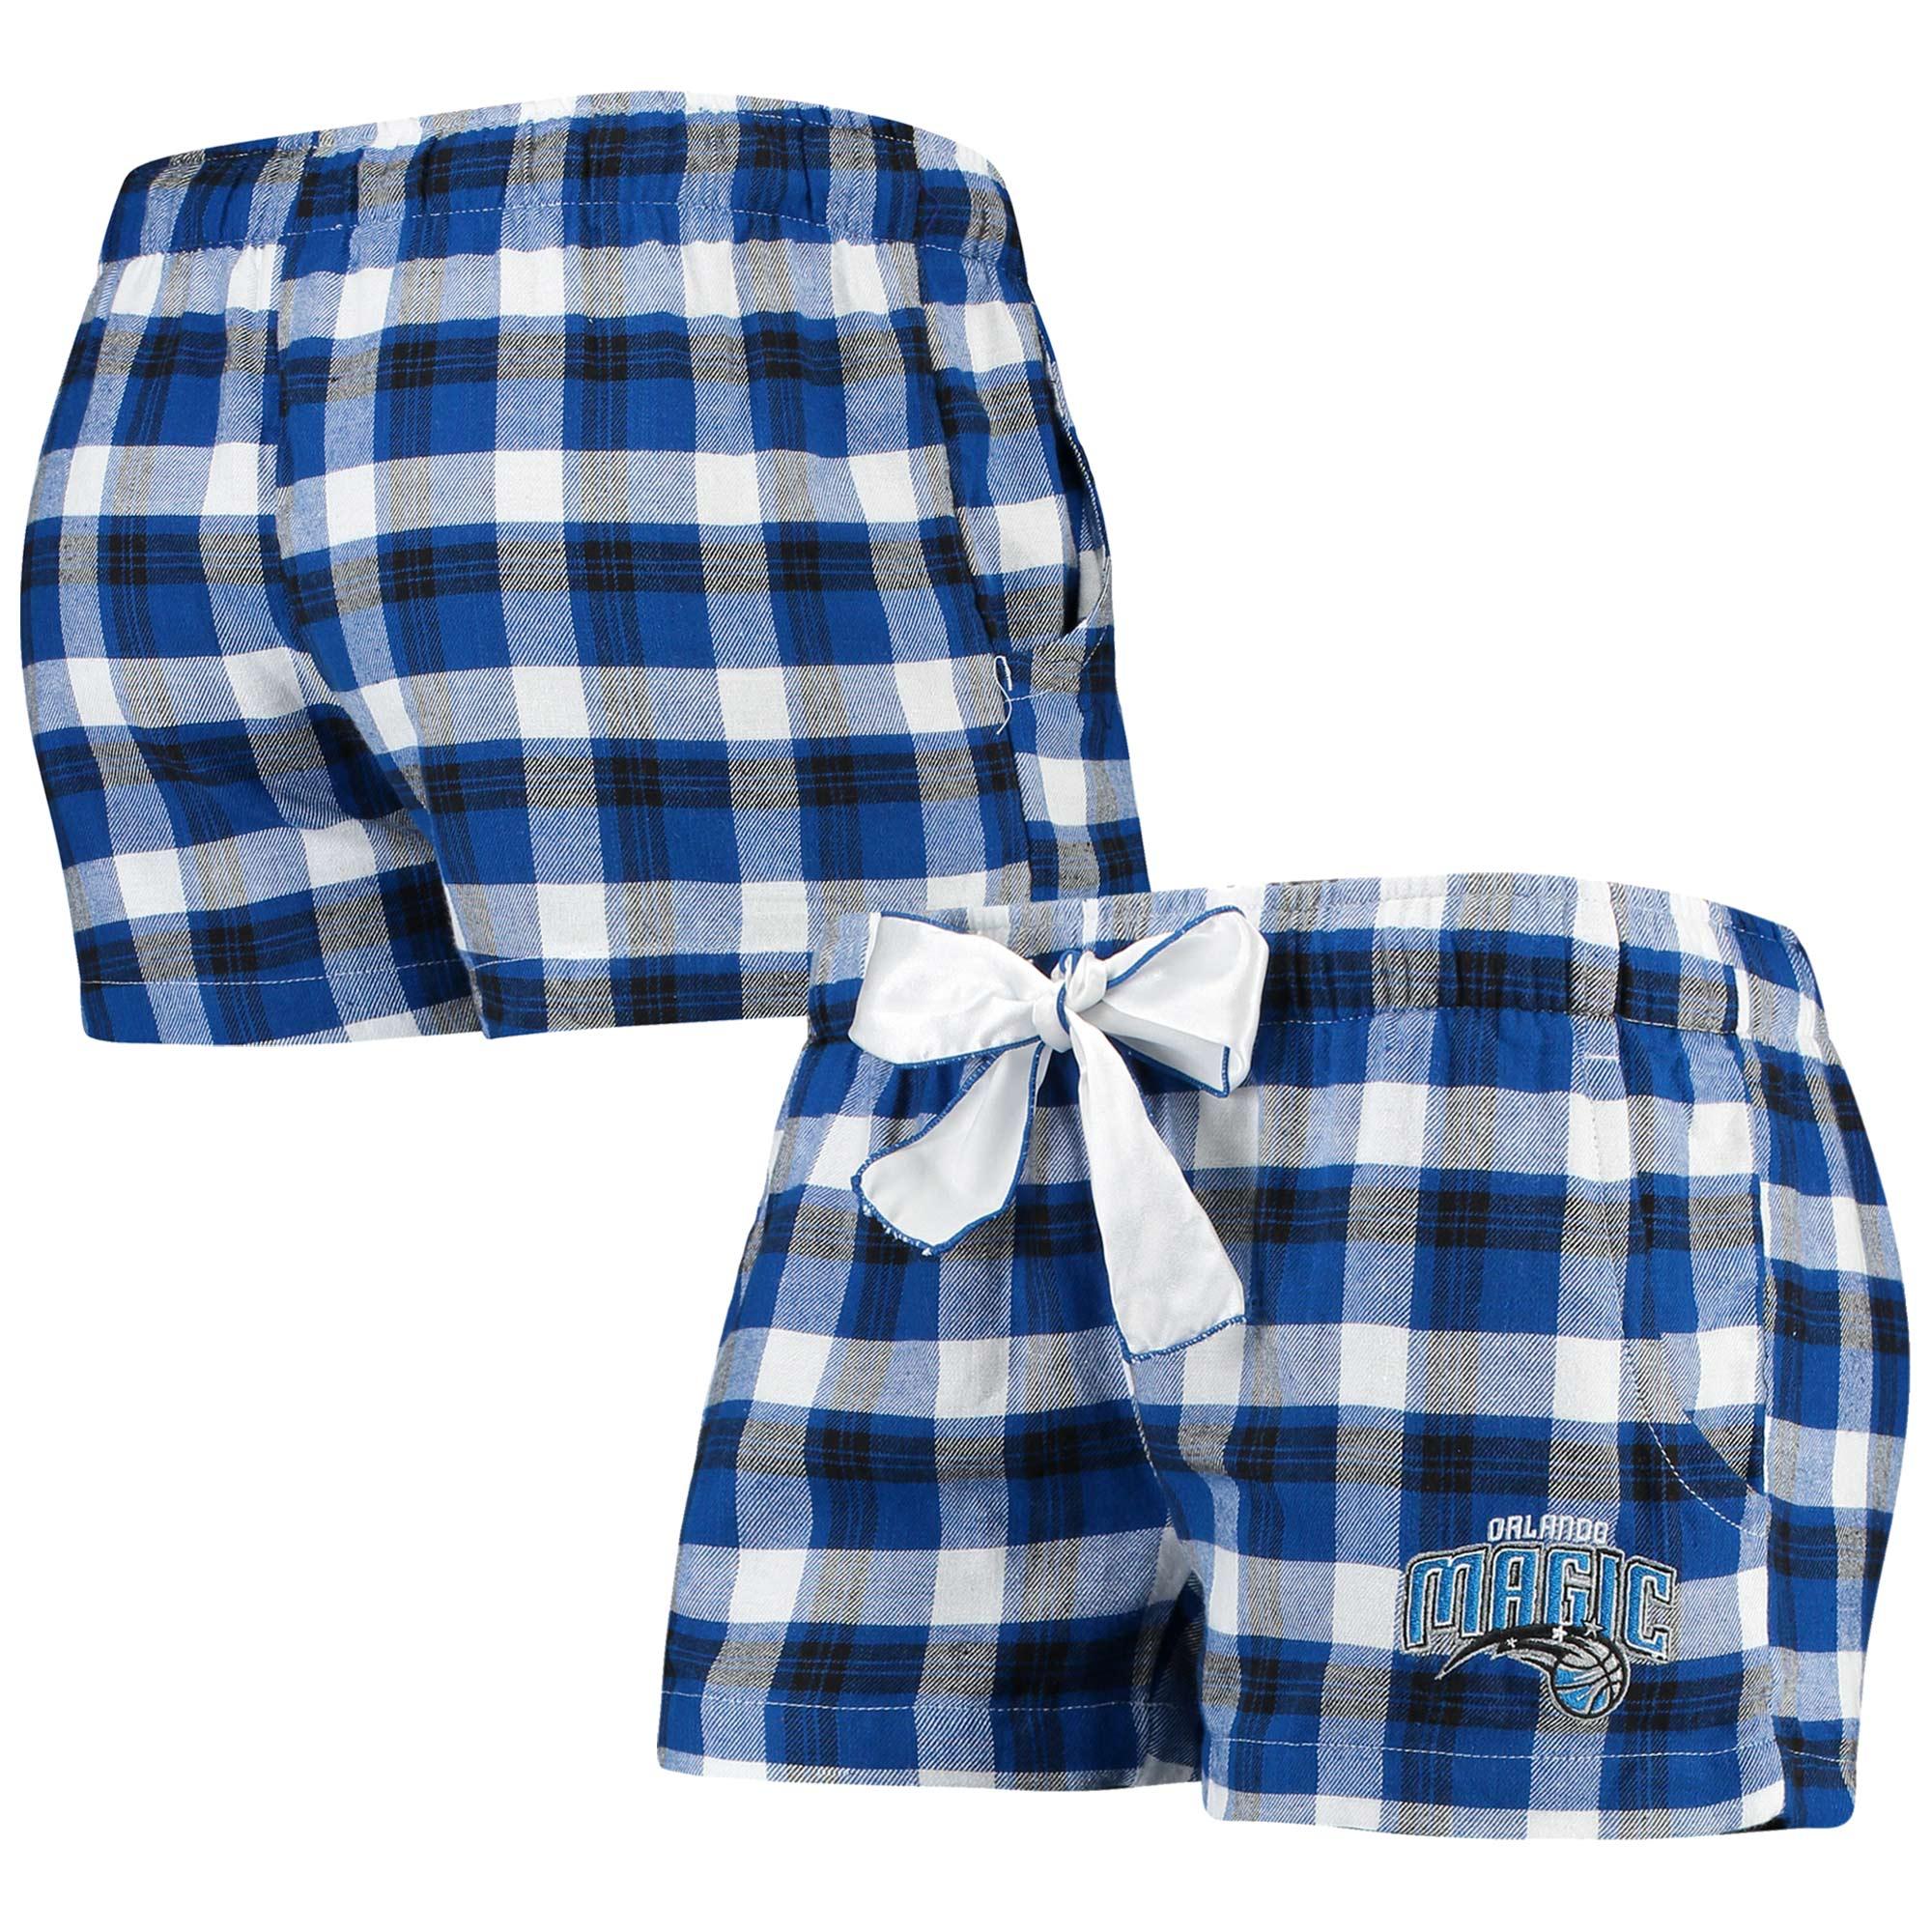 Orlando Magic Concepts Sport Women's Piedmont Flannel Sleep Shorts - Royal/Black